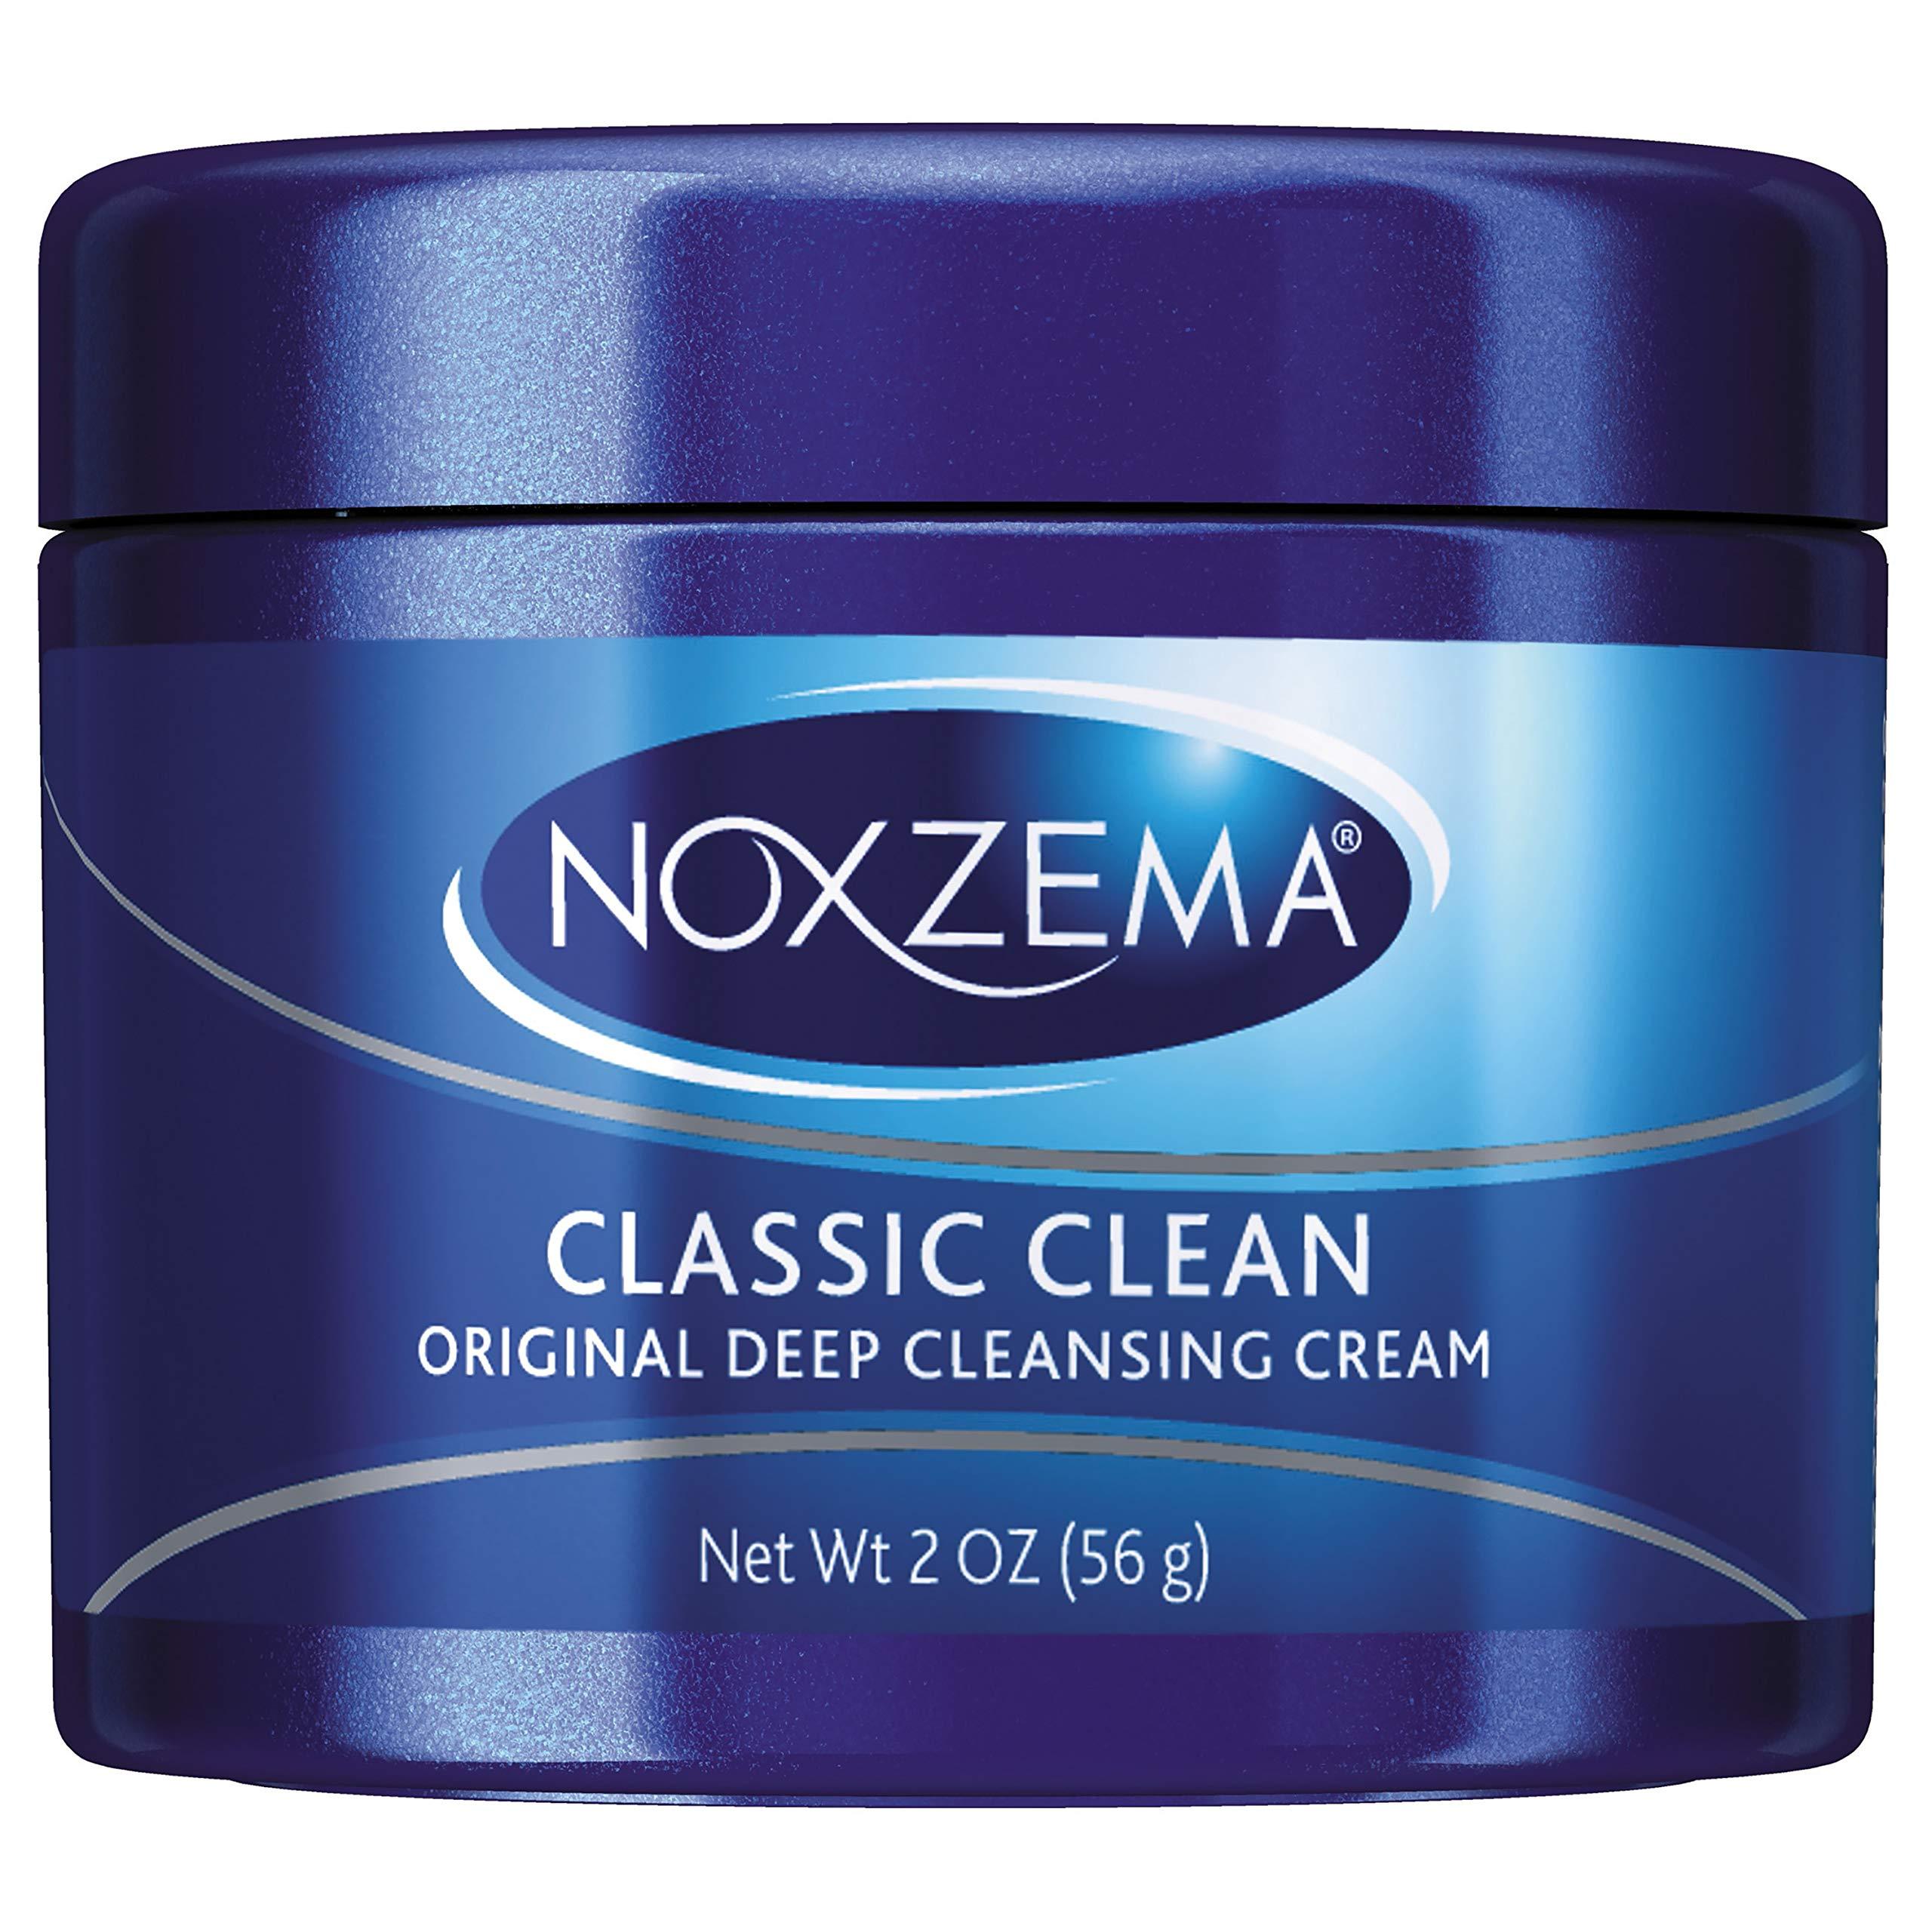 Noxzema - Noxzema Classic Clean Cleanser, Original Deep Cleansing, 2 oz